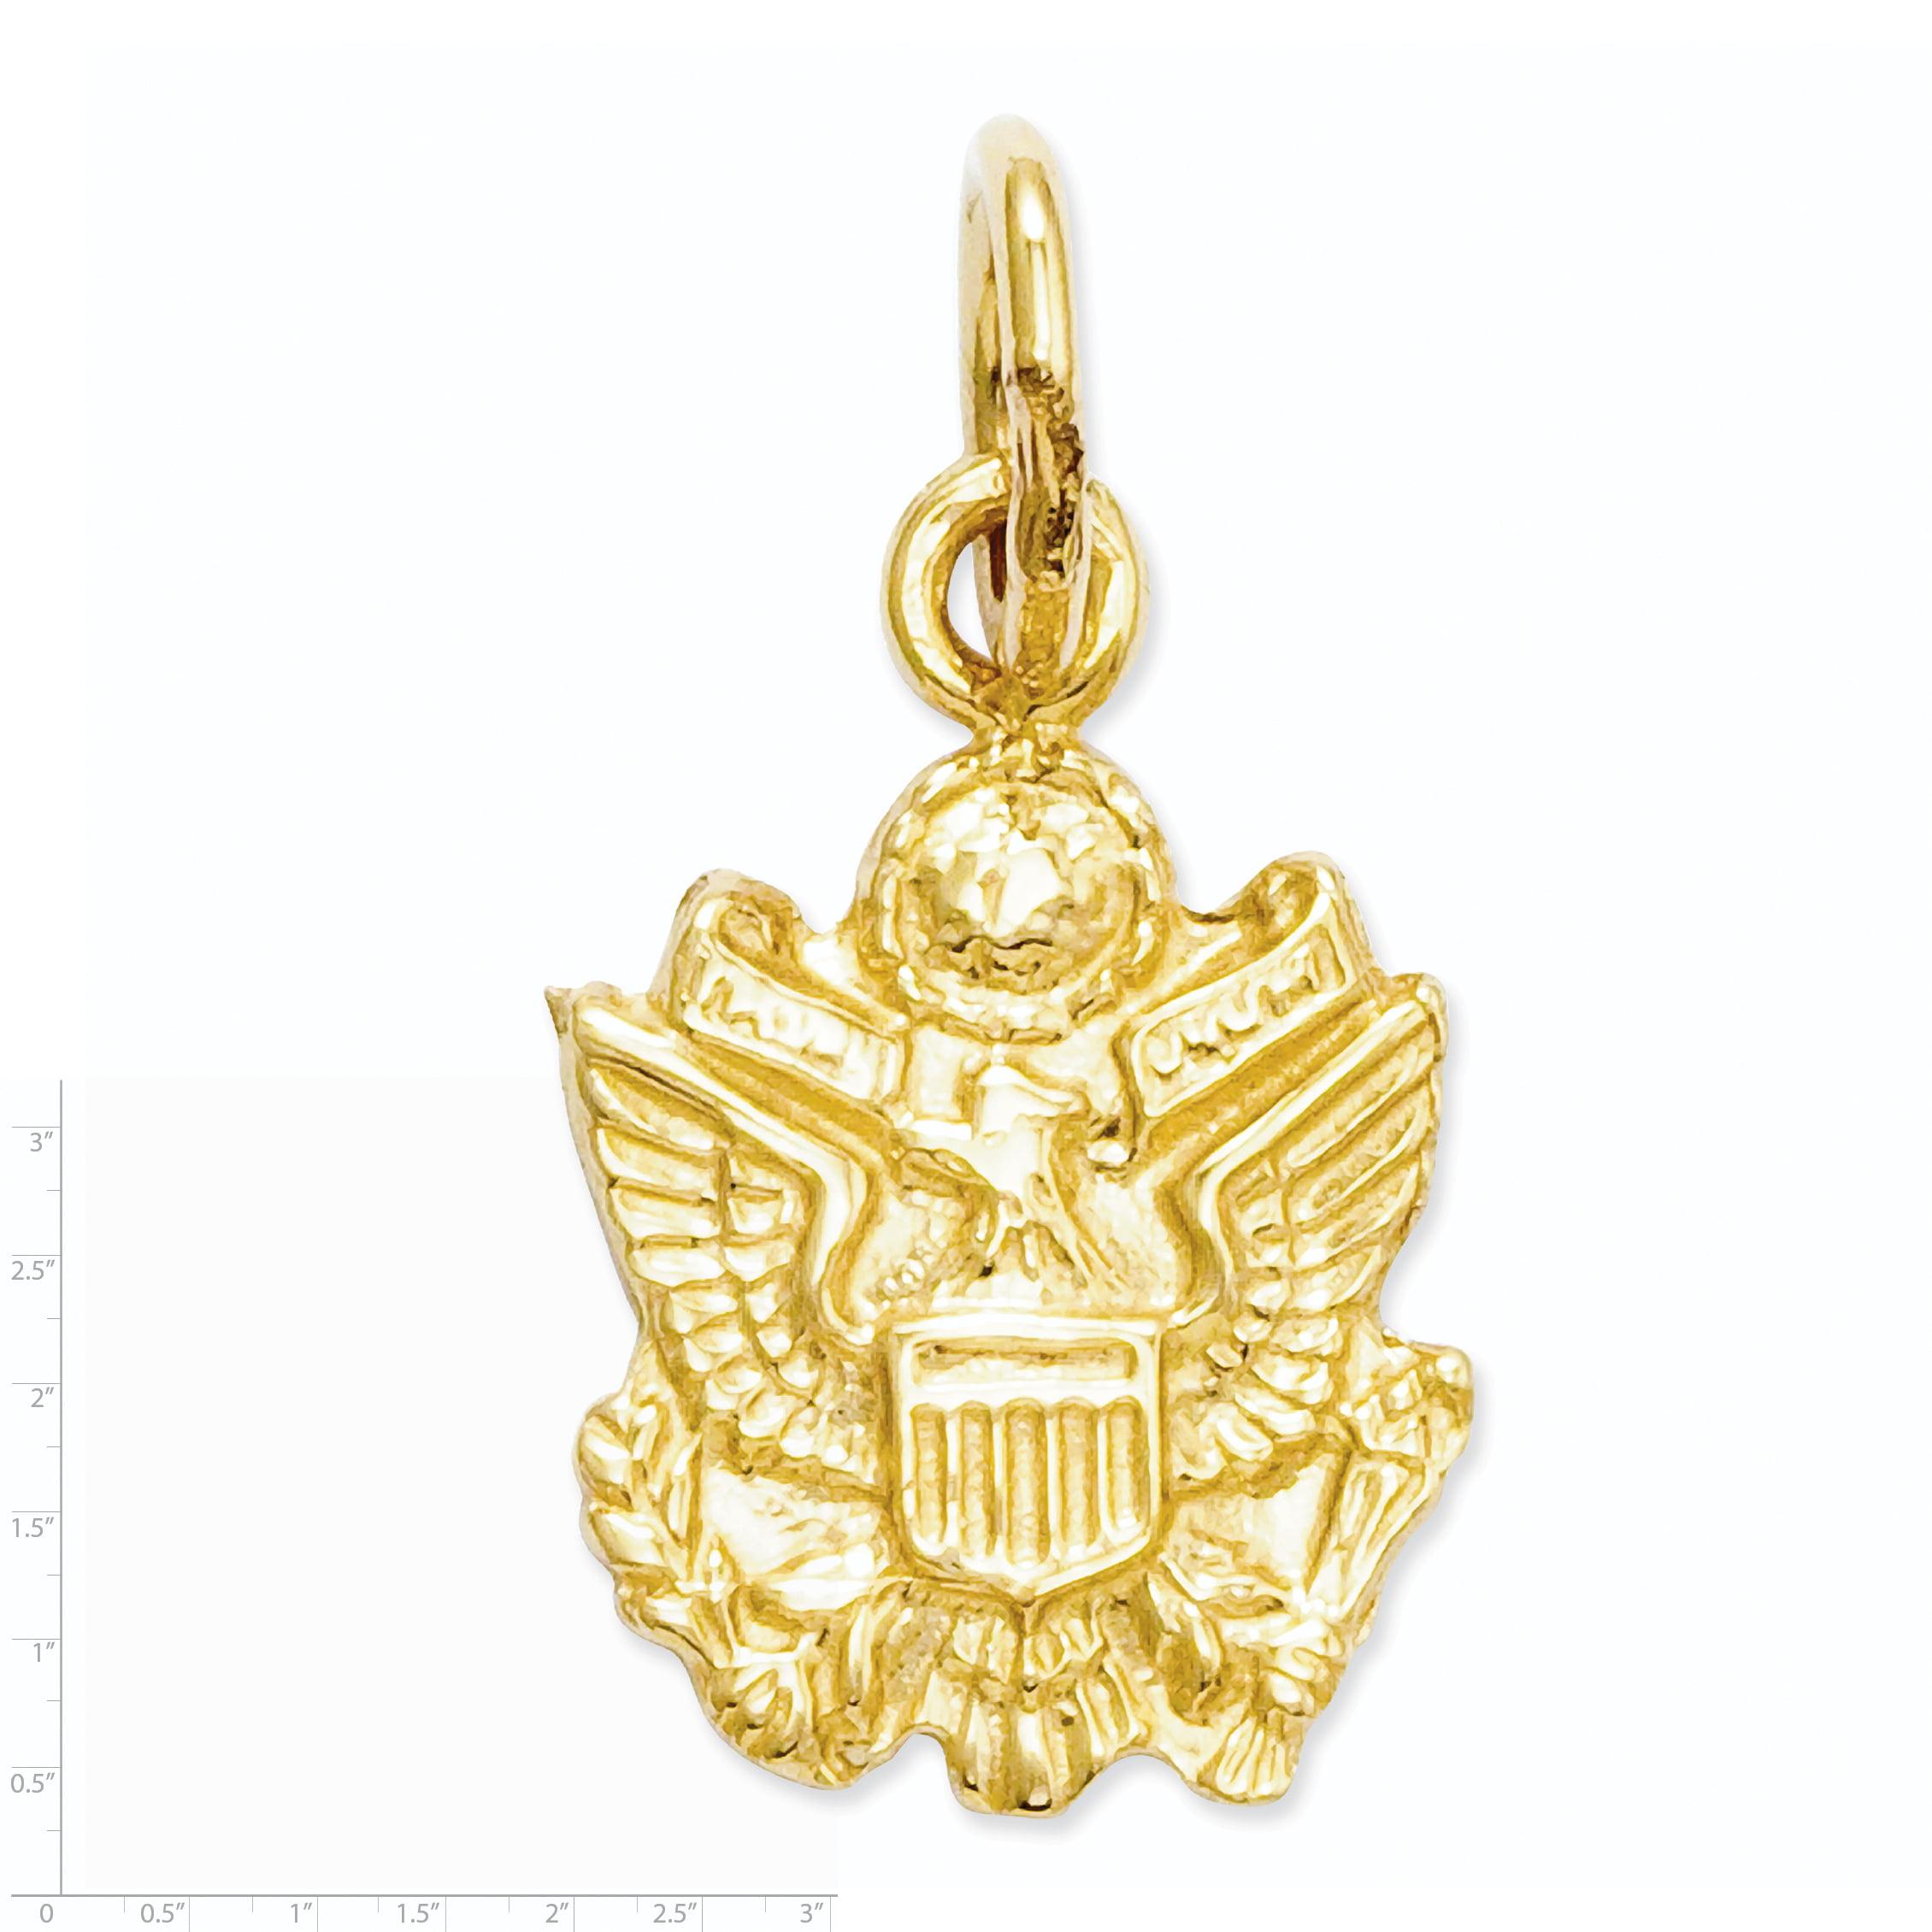 14k U. S. Army Insignia Charm A0223 (16.5mm x 9mm) - image 2 de 3